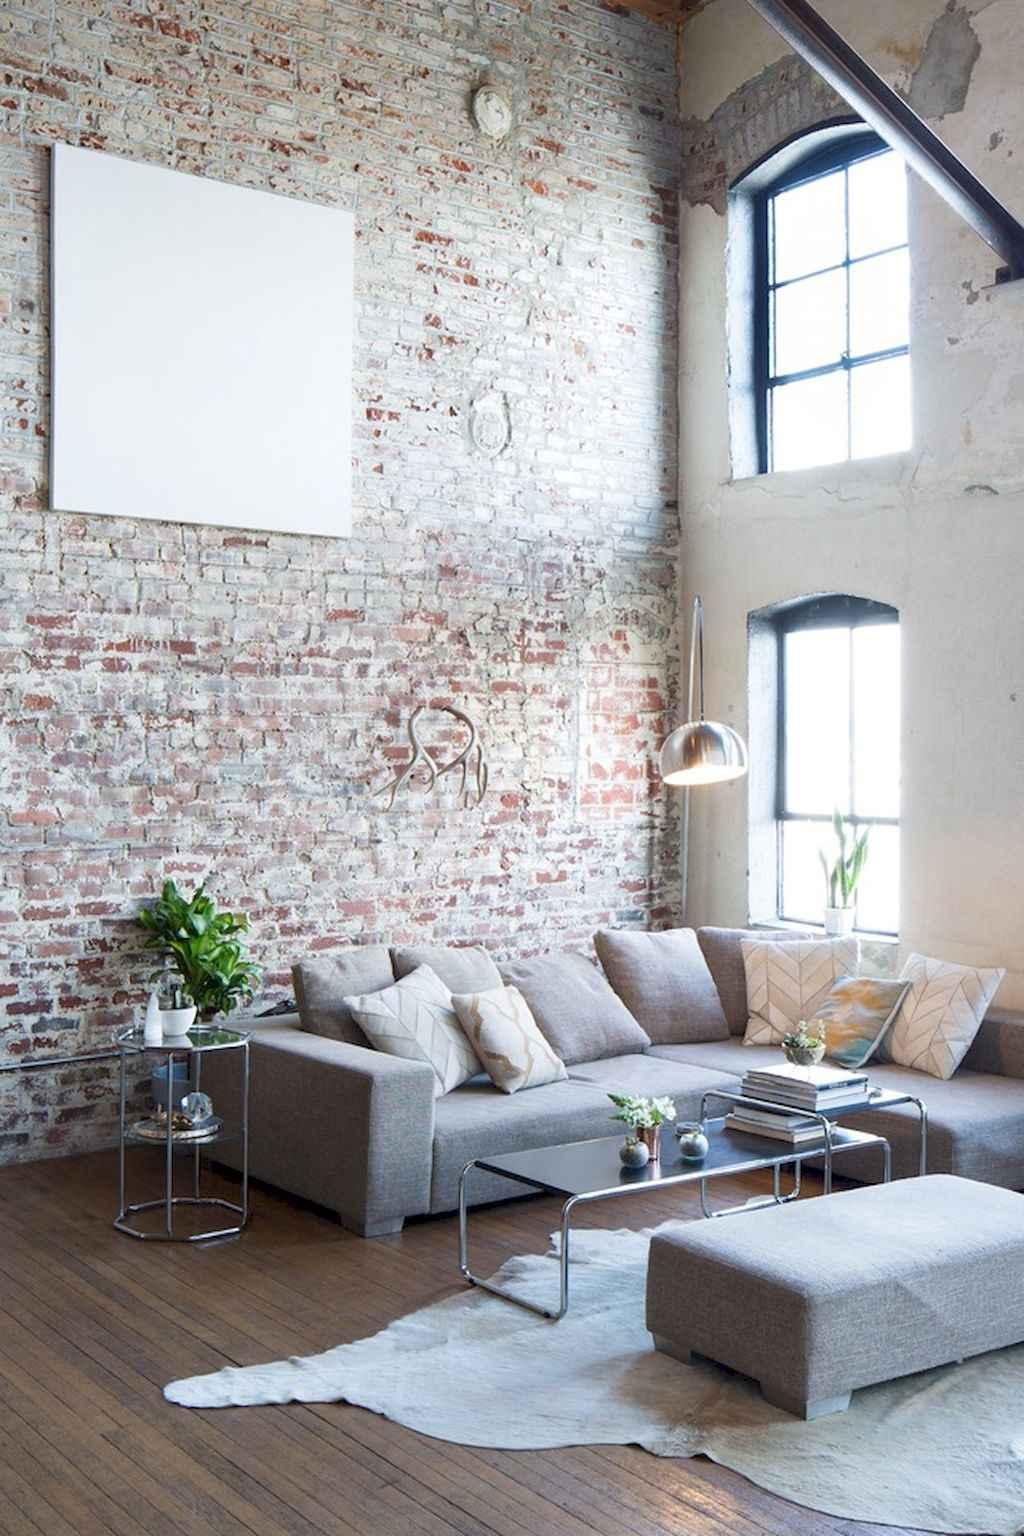 Cool creative loft apartment decorating ideas (54)